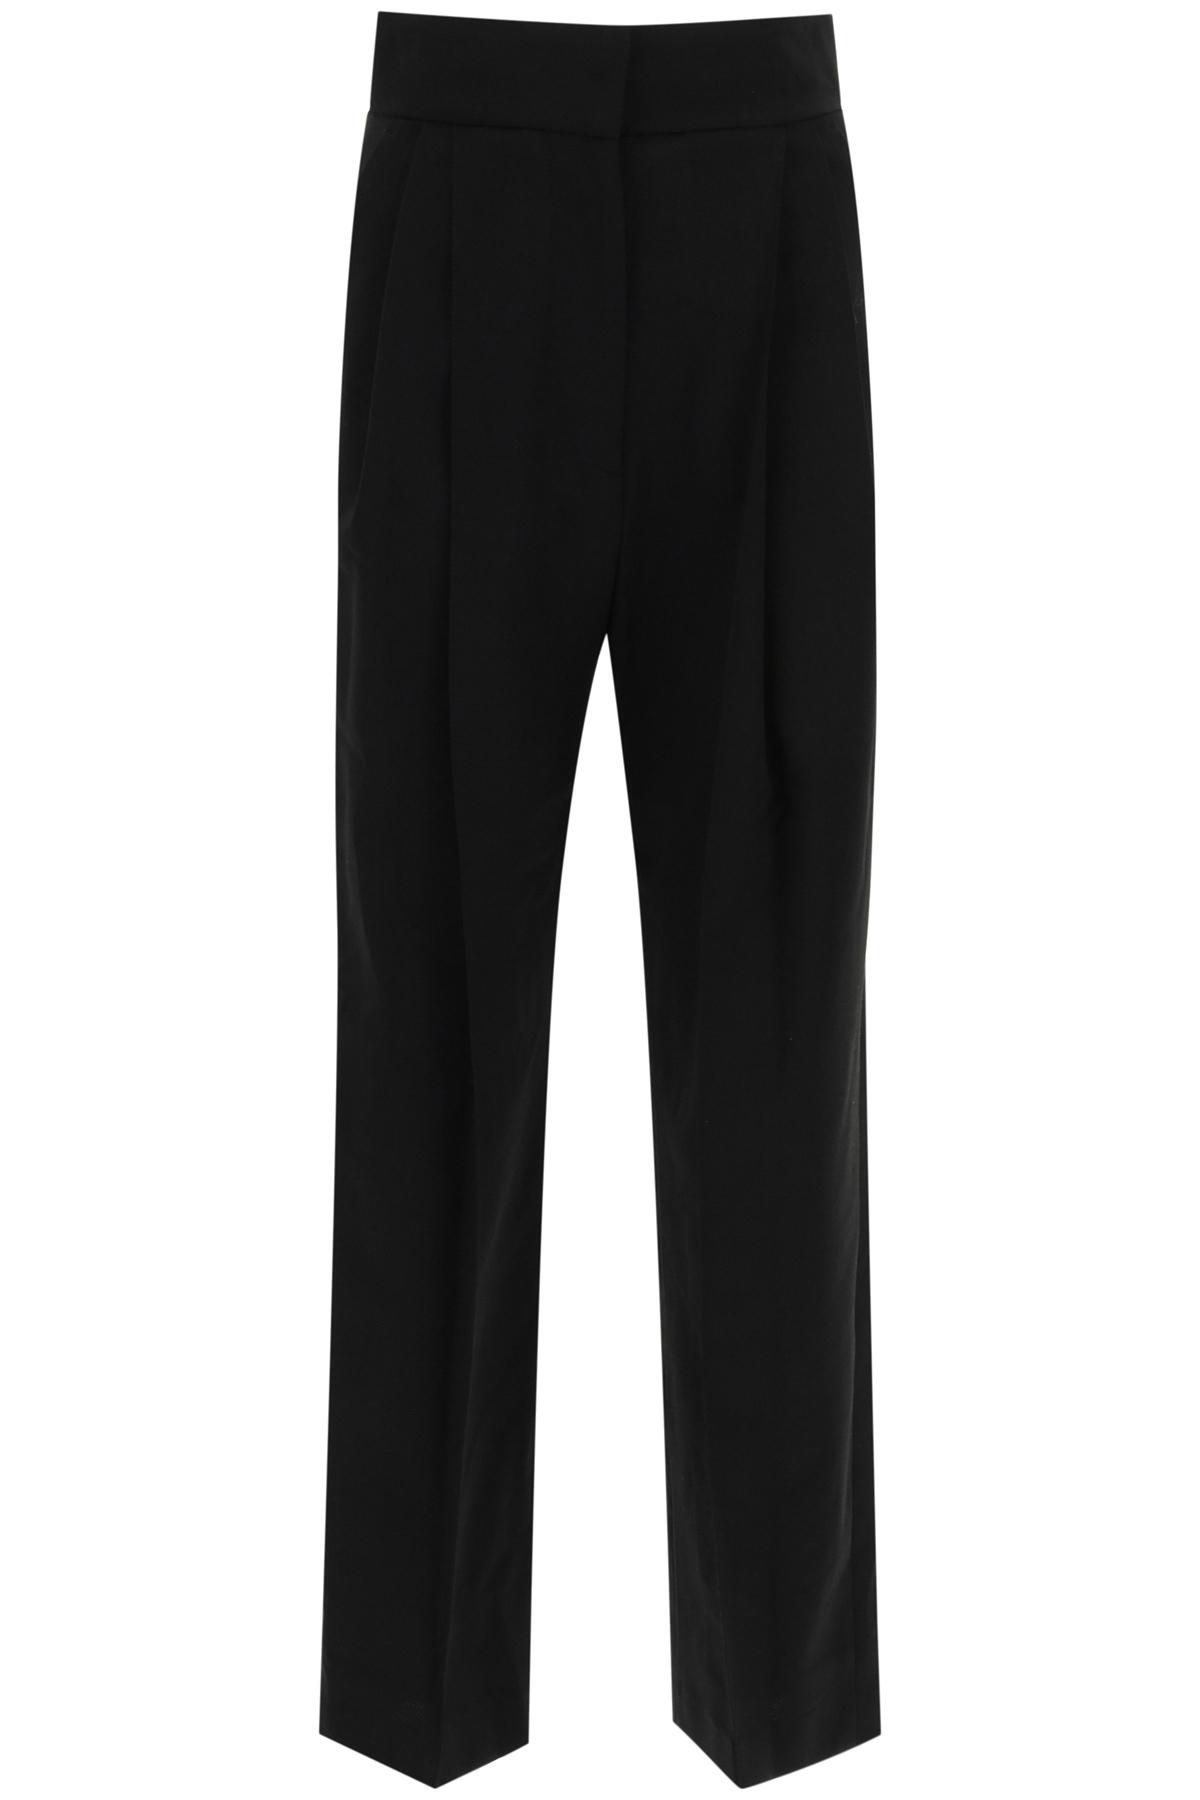 Low classic pantaloni pintuck con pinces